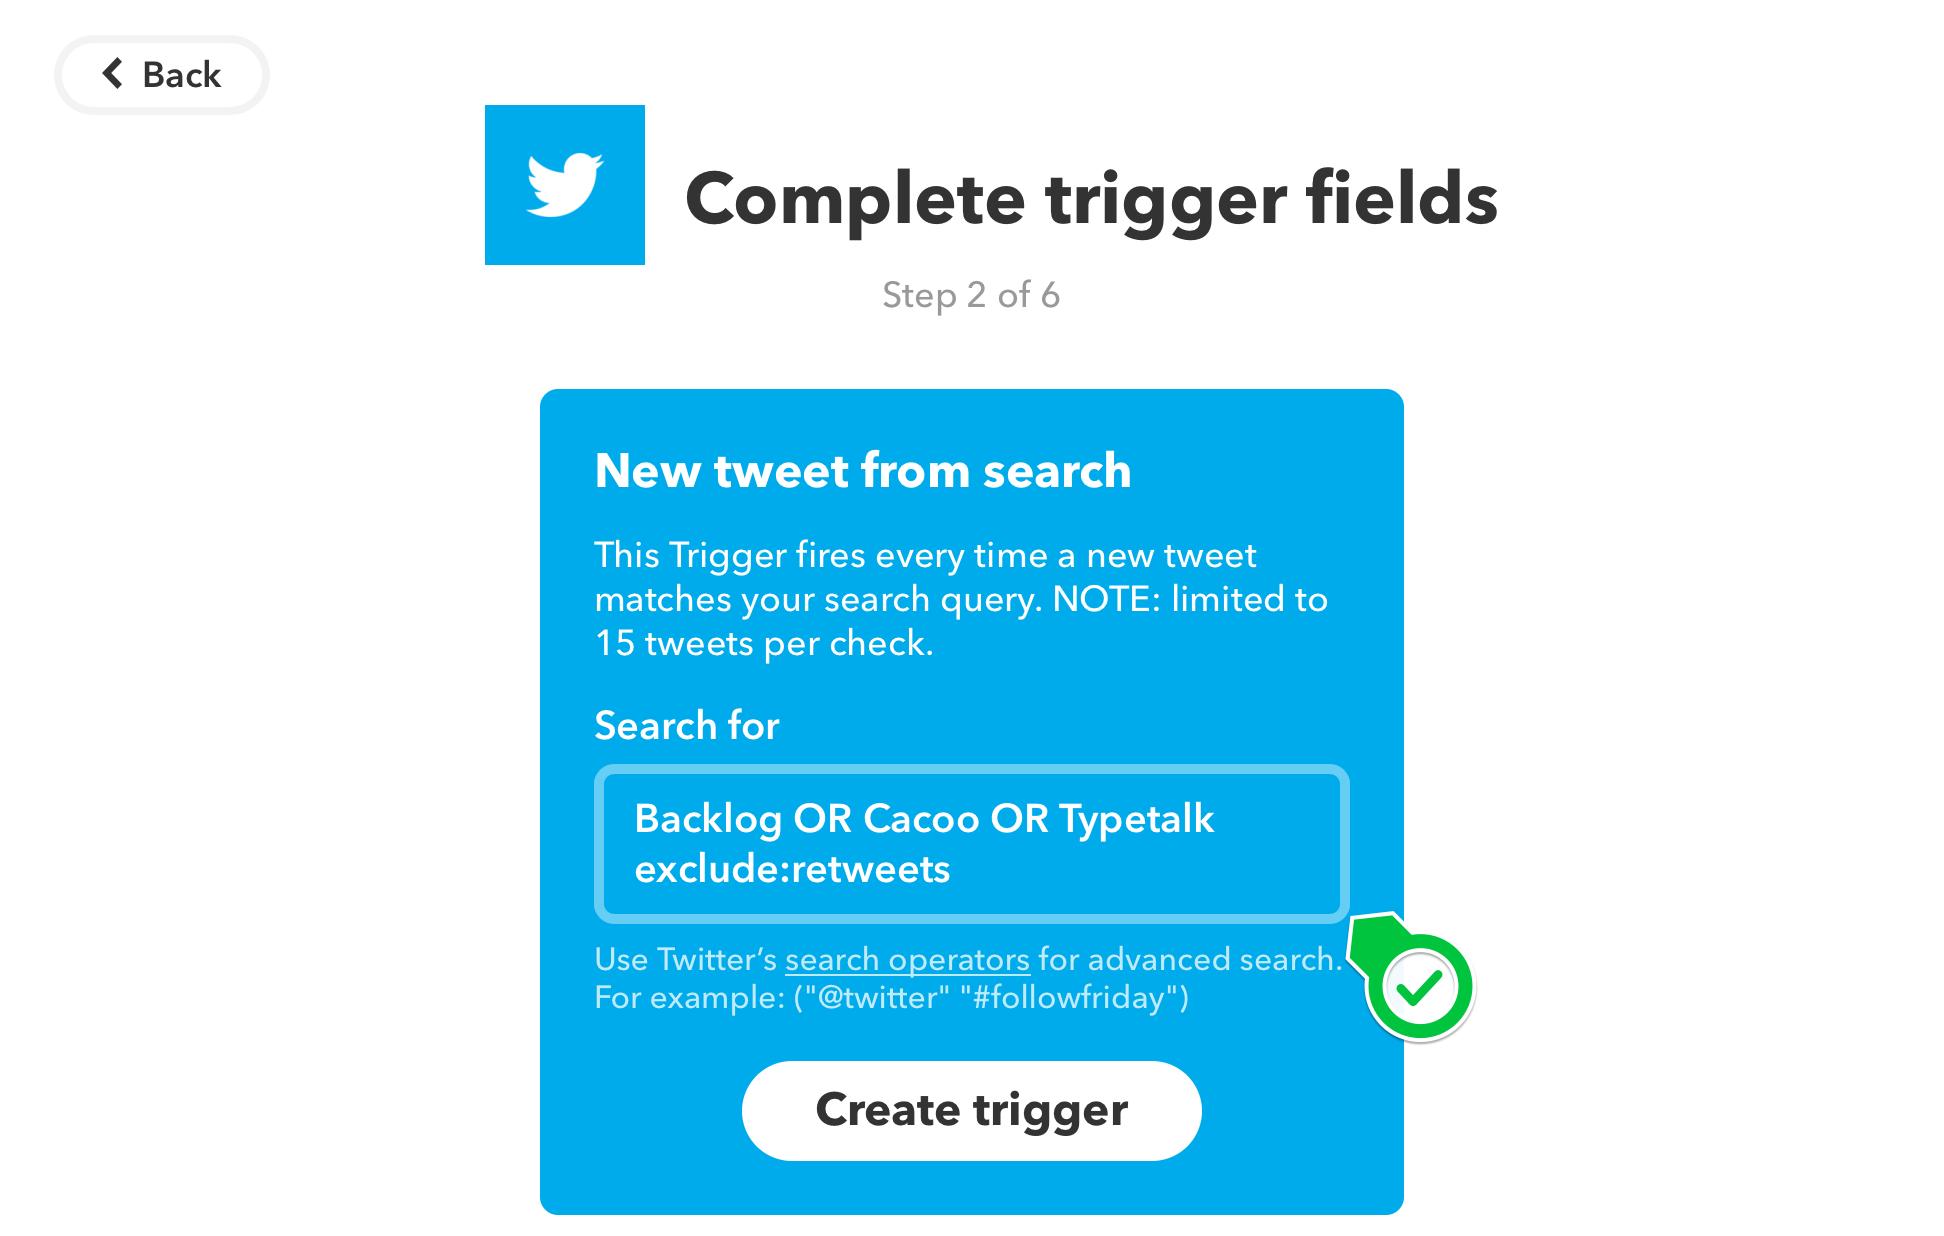 click Create trigger